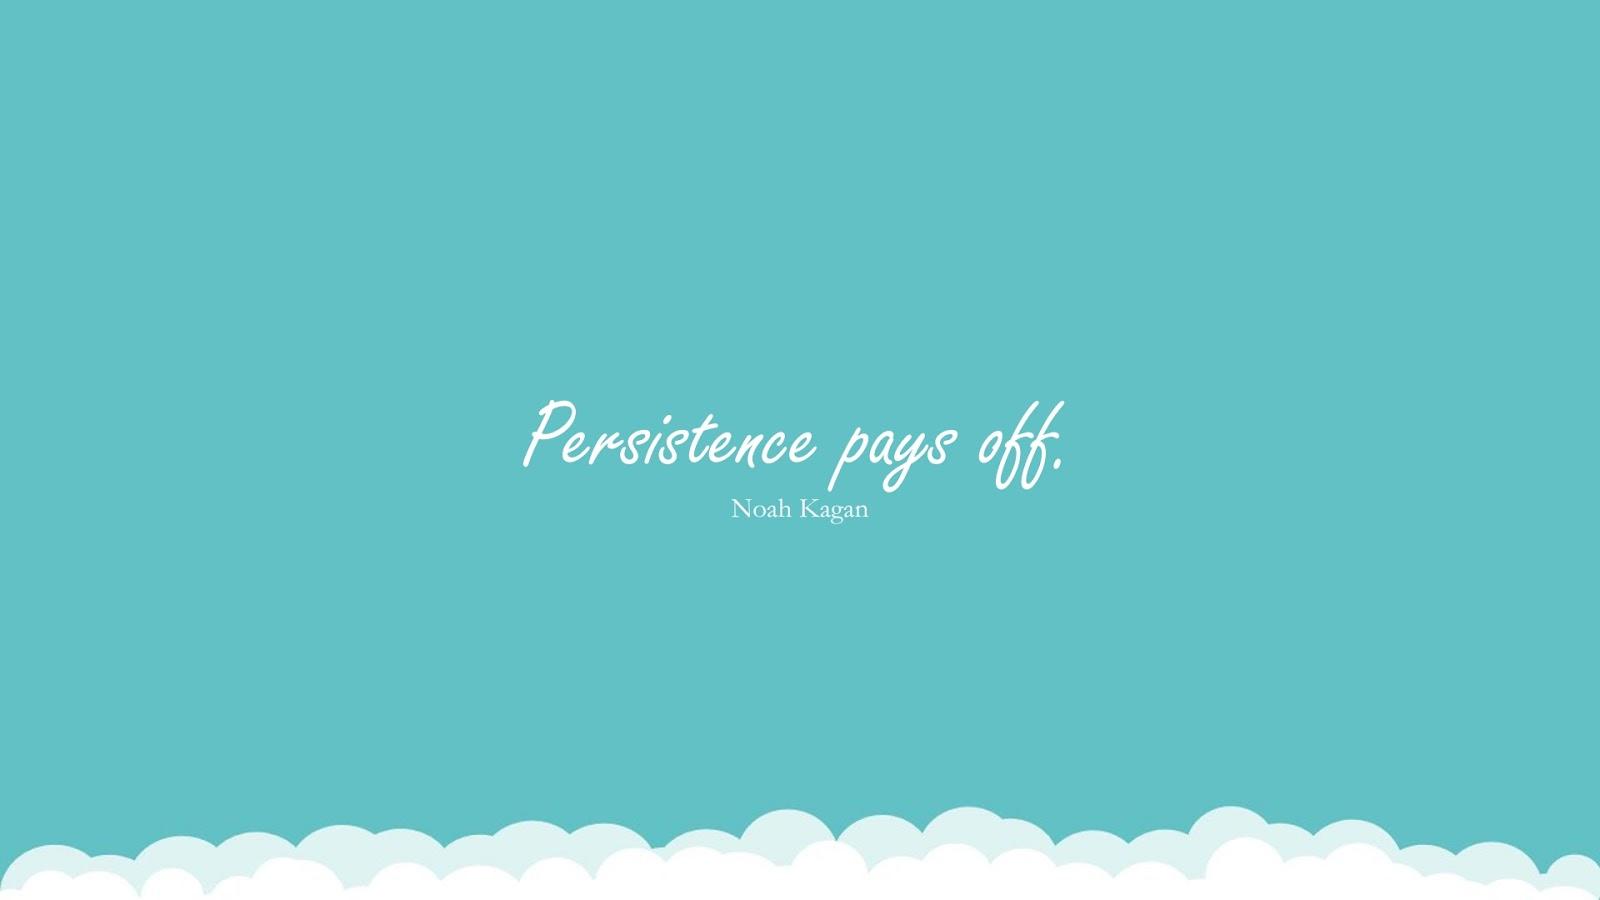 Persistence pays off. (Noah Kagan);  #PerseveranceQuotes